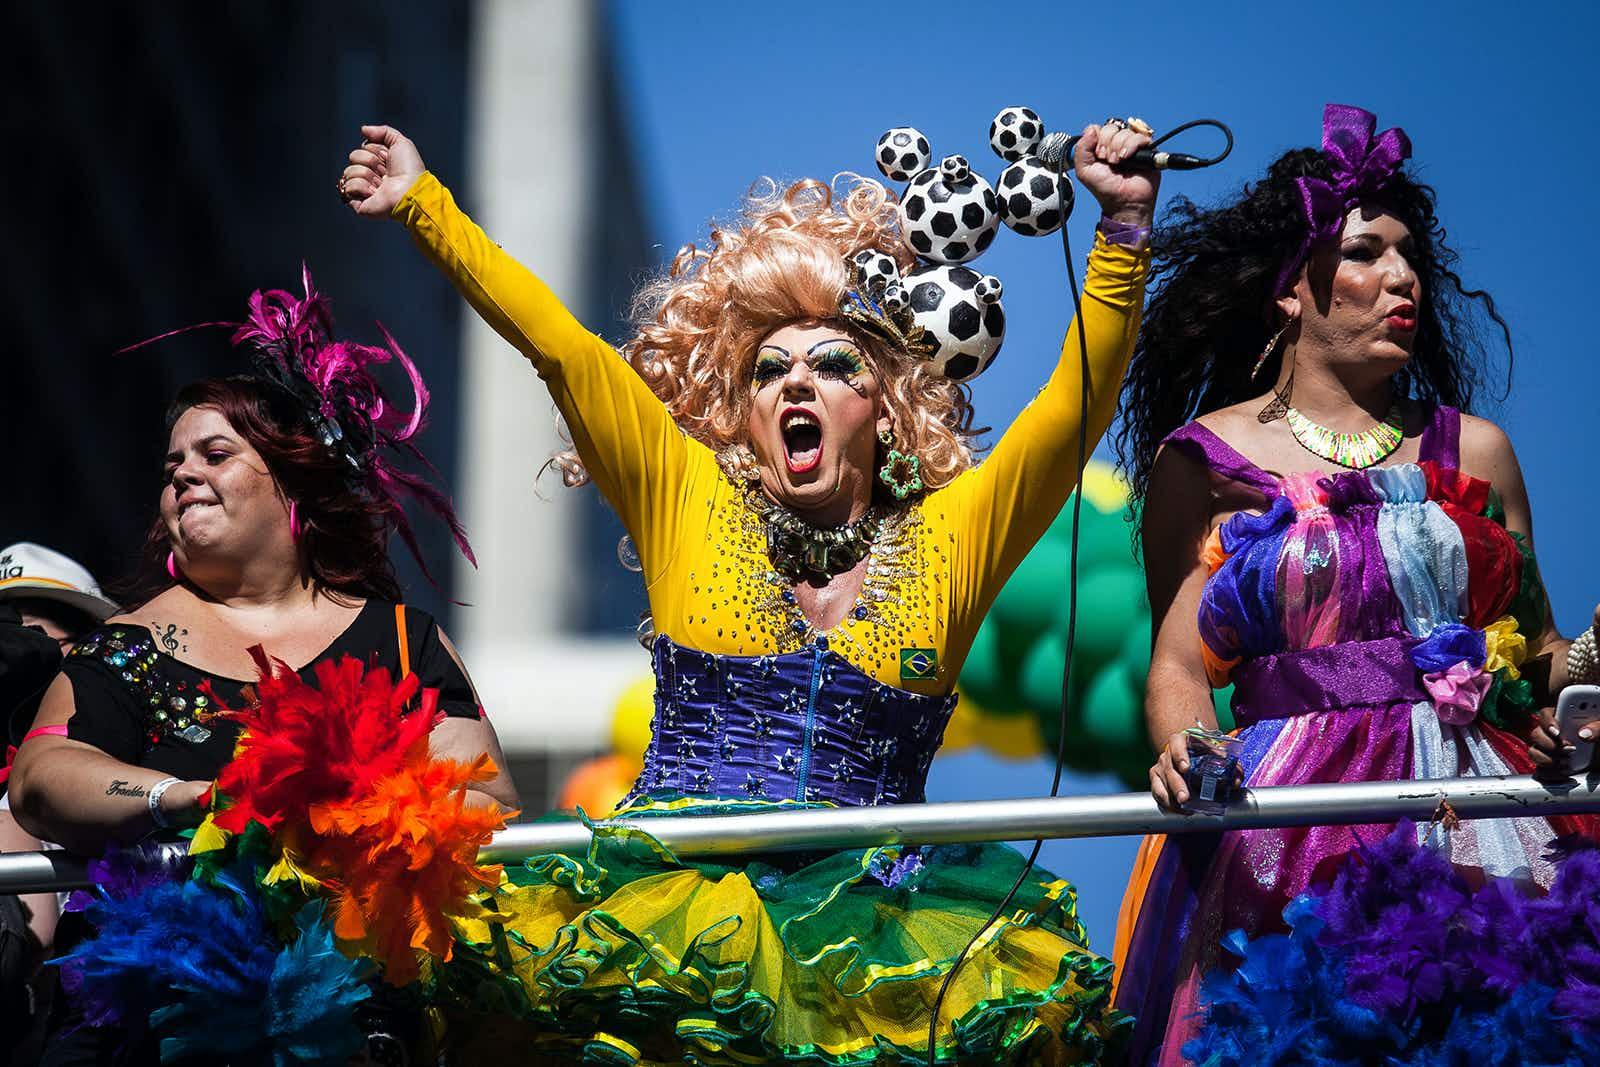 Three brightly clothed individuals celebrate Pride in Sao Paulo